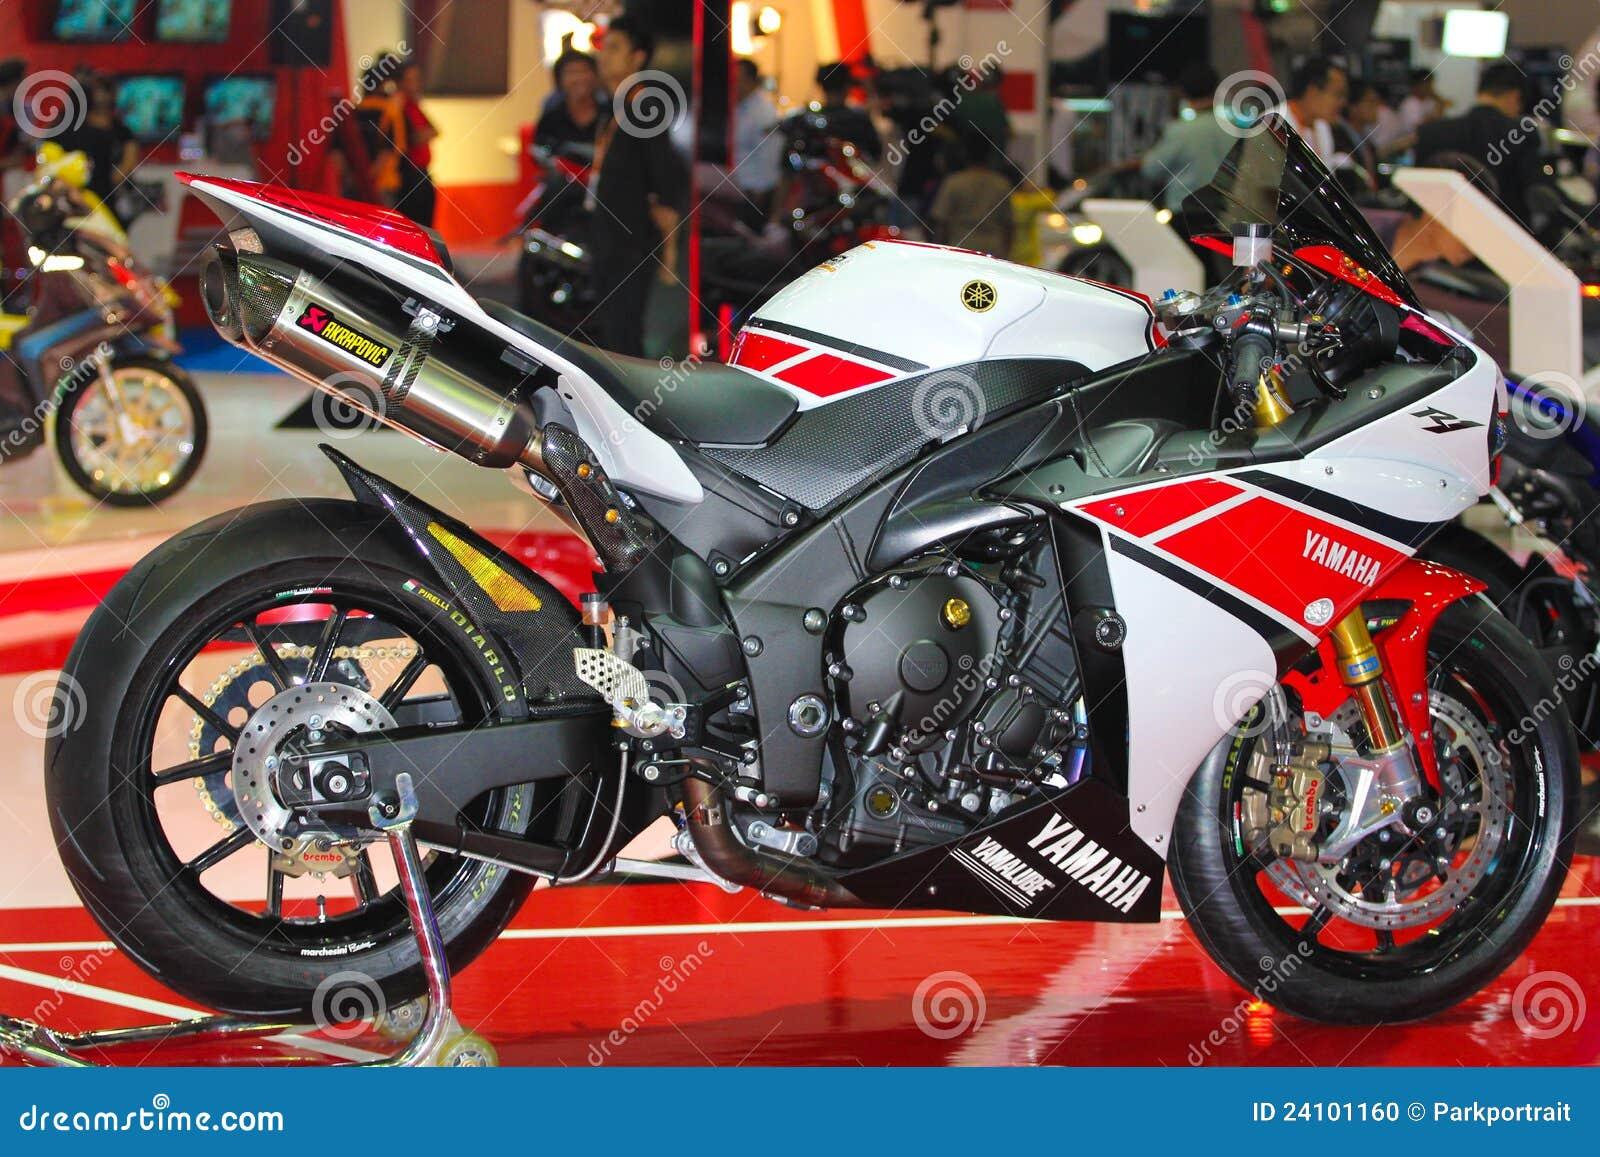 Yamaha r1 motor show 2012 editorial image image 24101160 for Yamaha motor credit card